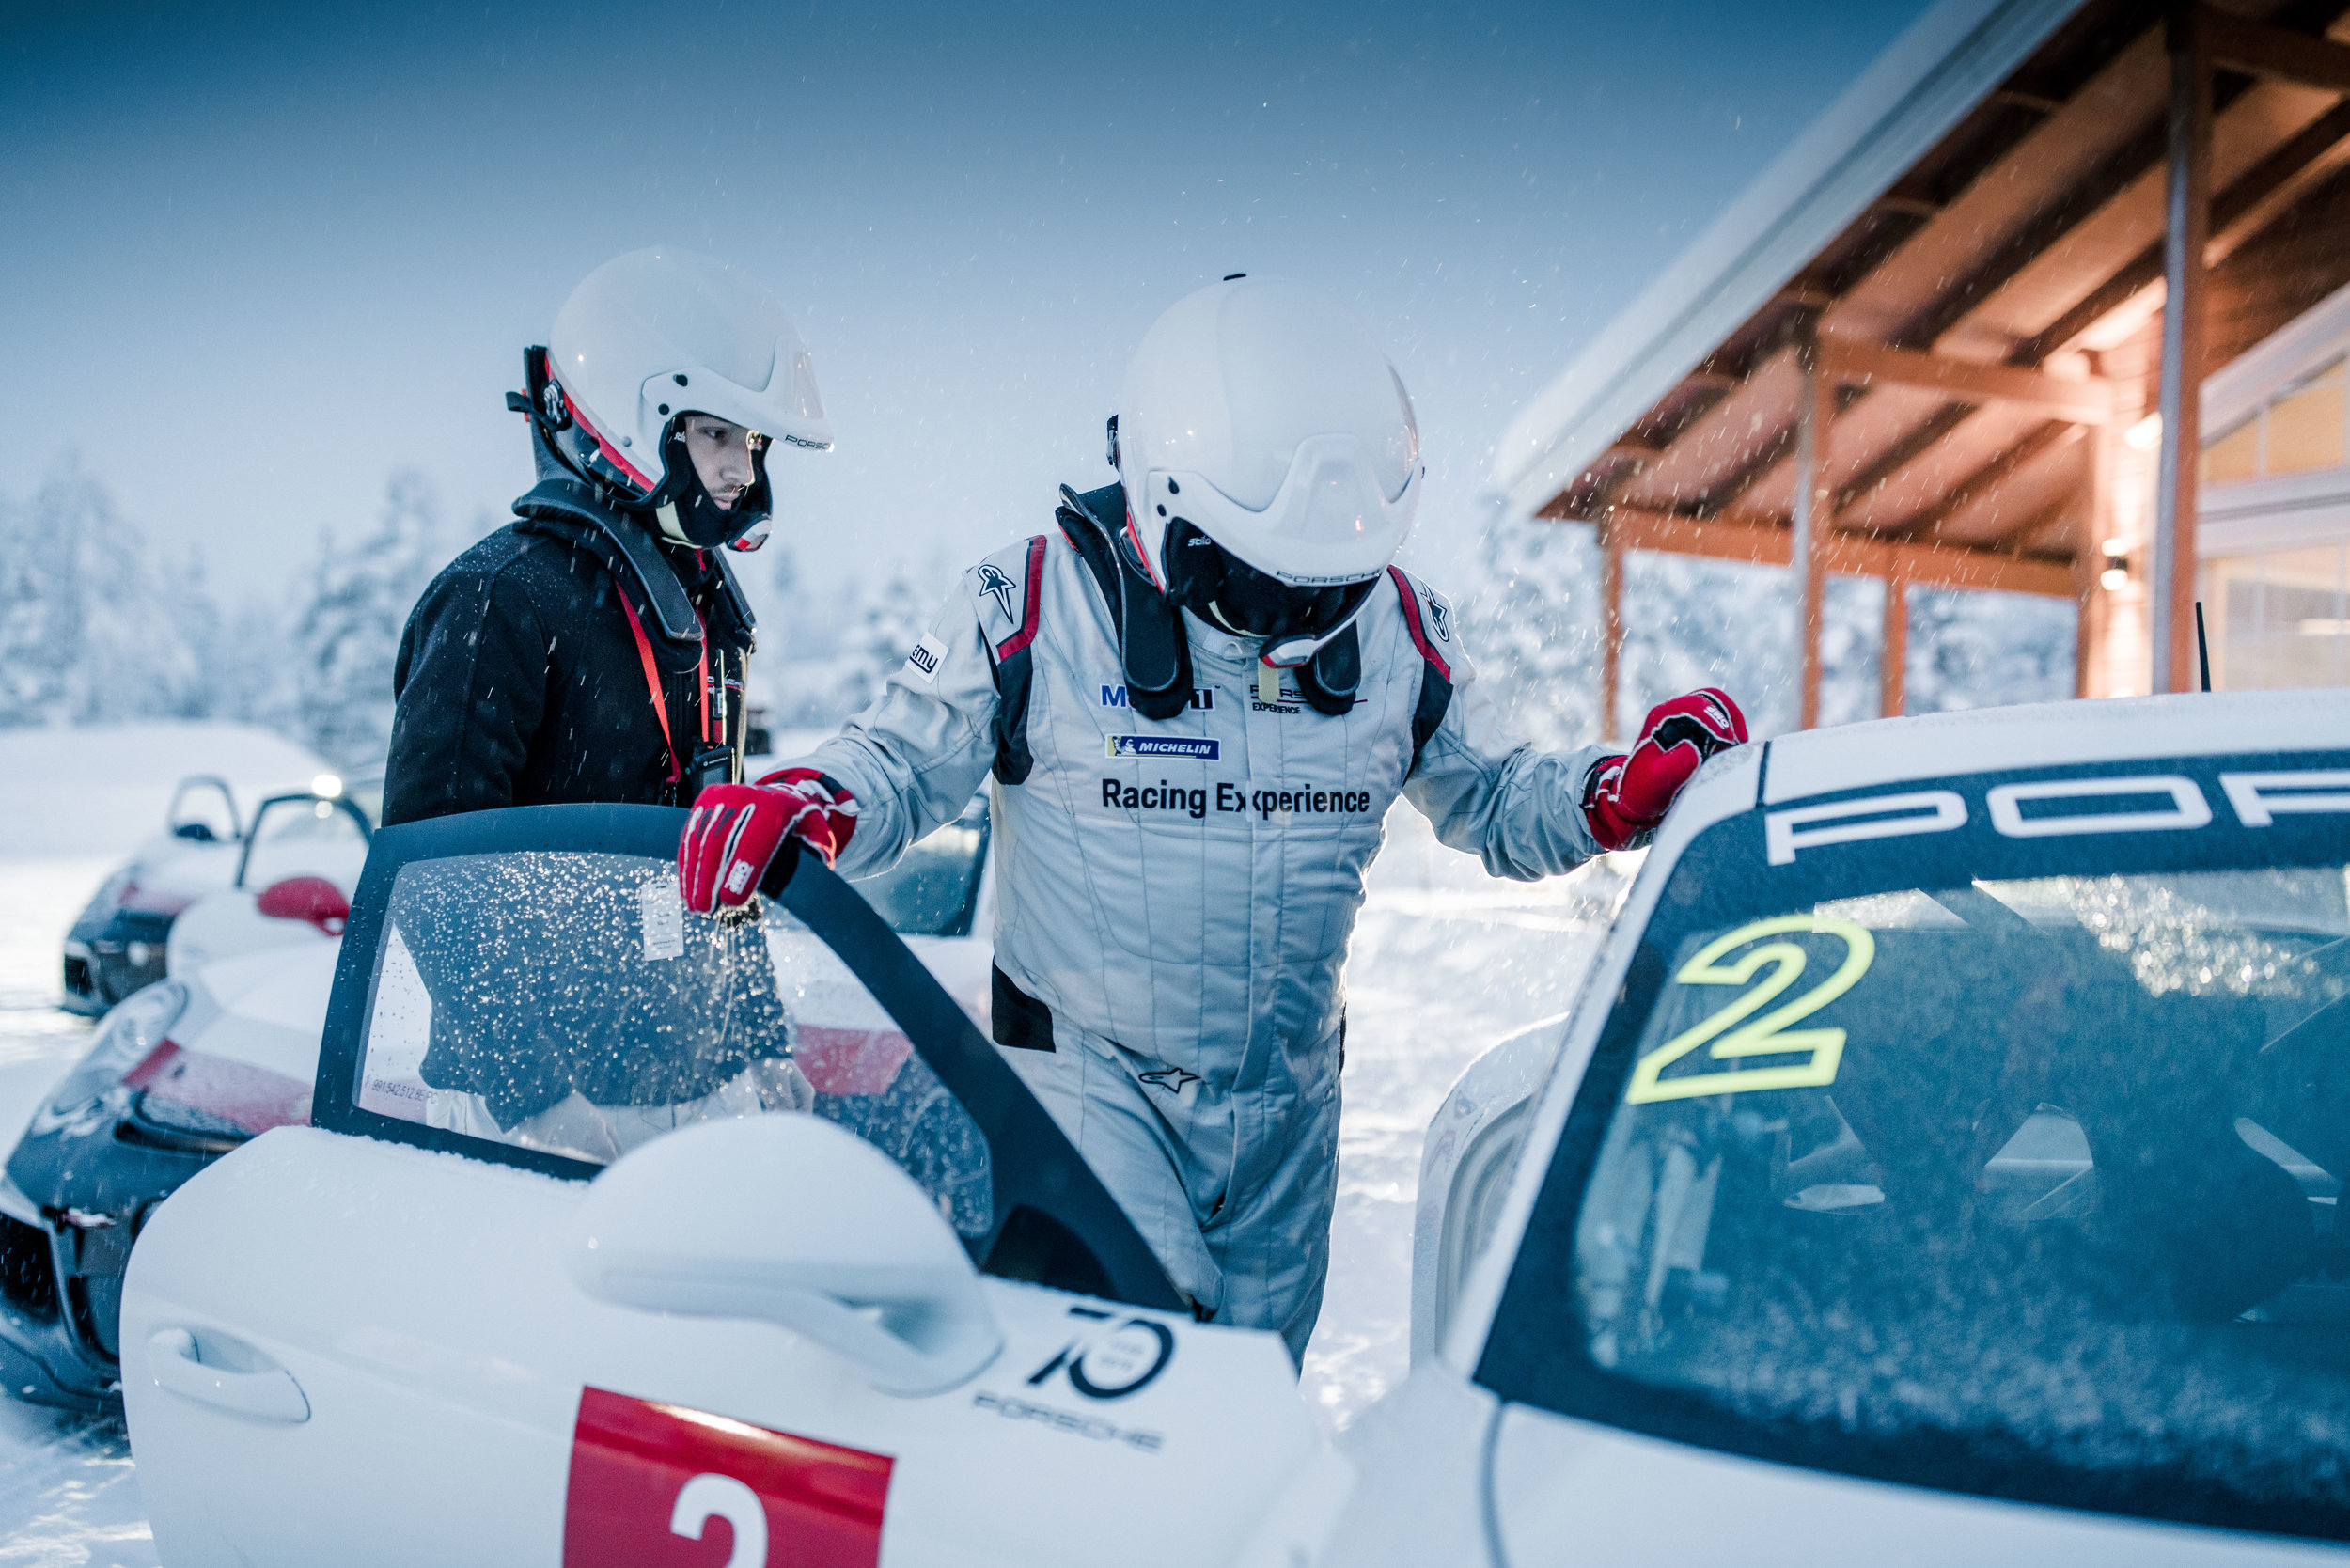 Porsche Ice Experience on Ice_30_01_2019_0084_175608.jpg